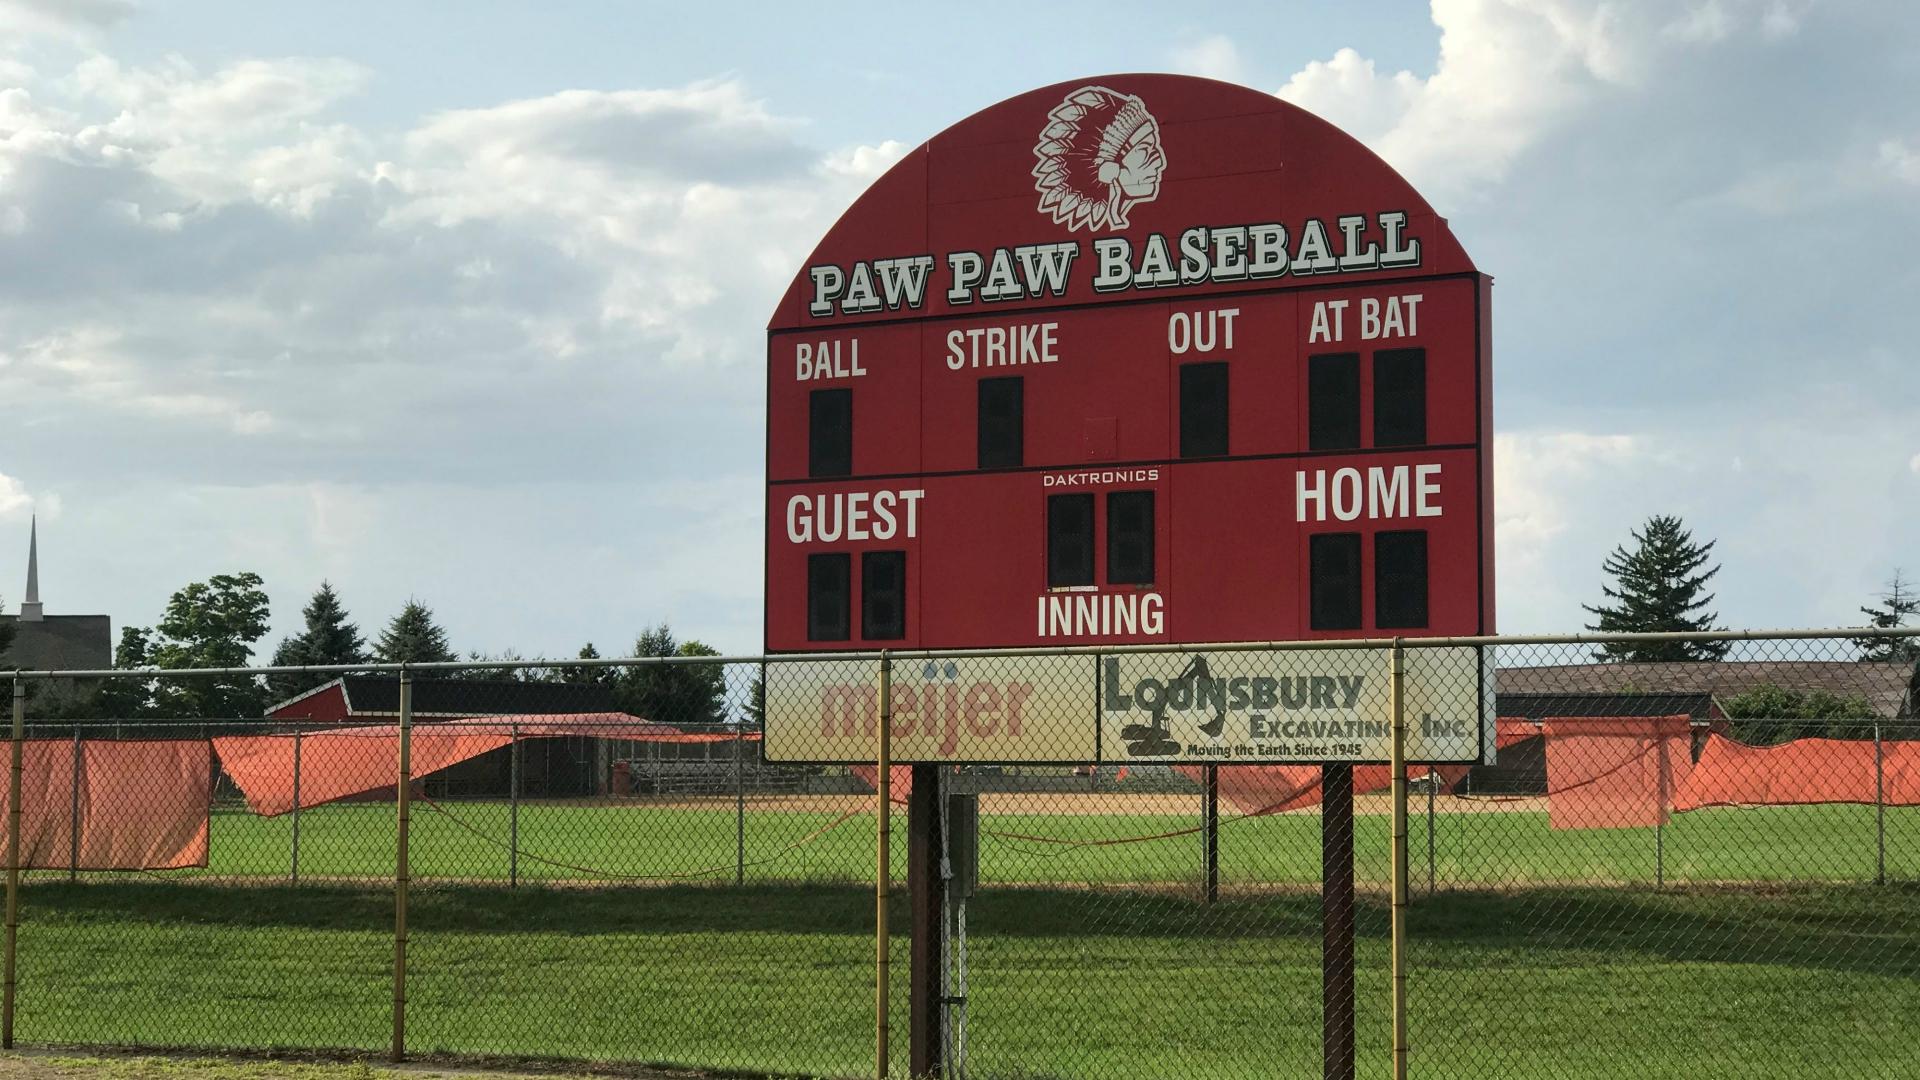 paw paw redskins baseball 081518_1534380629914.jpg.jpg